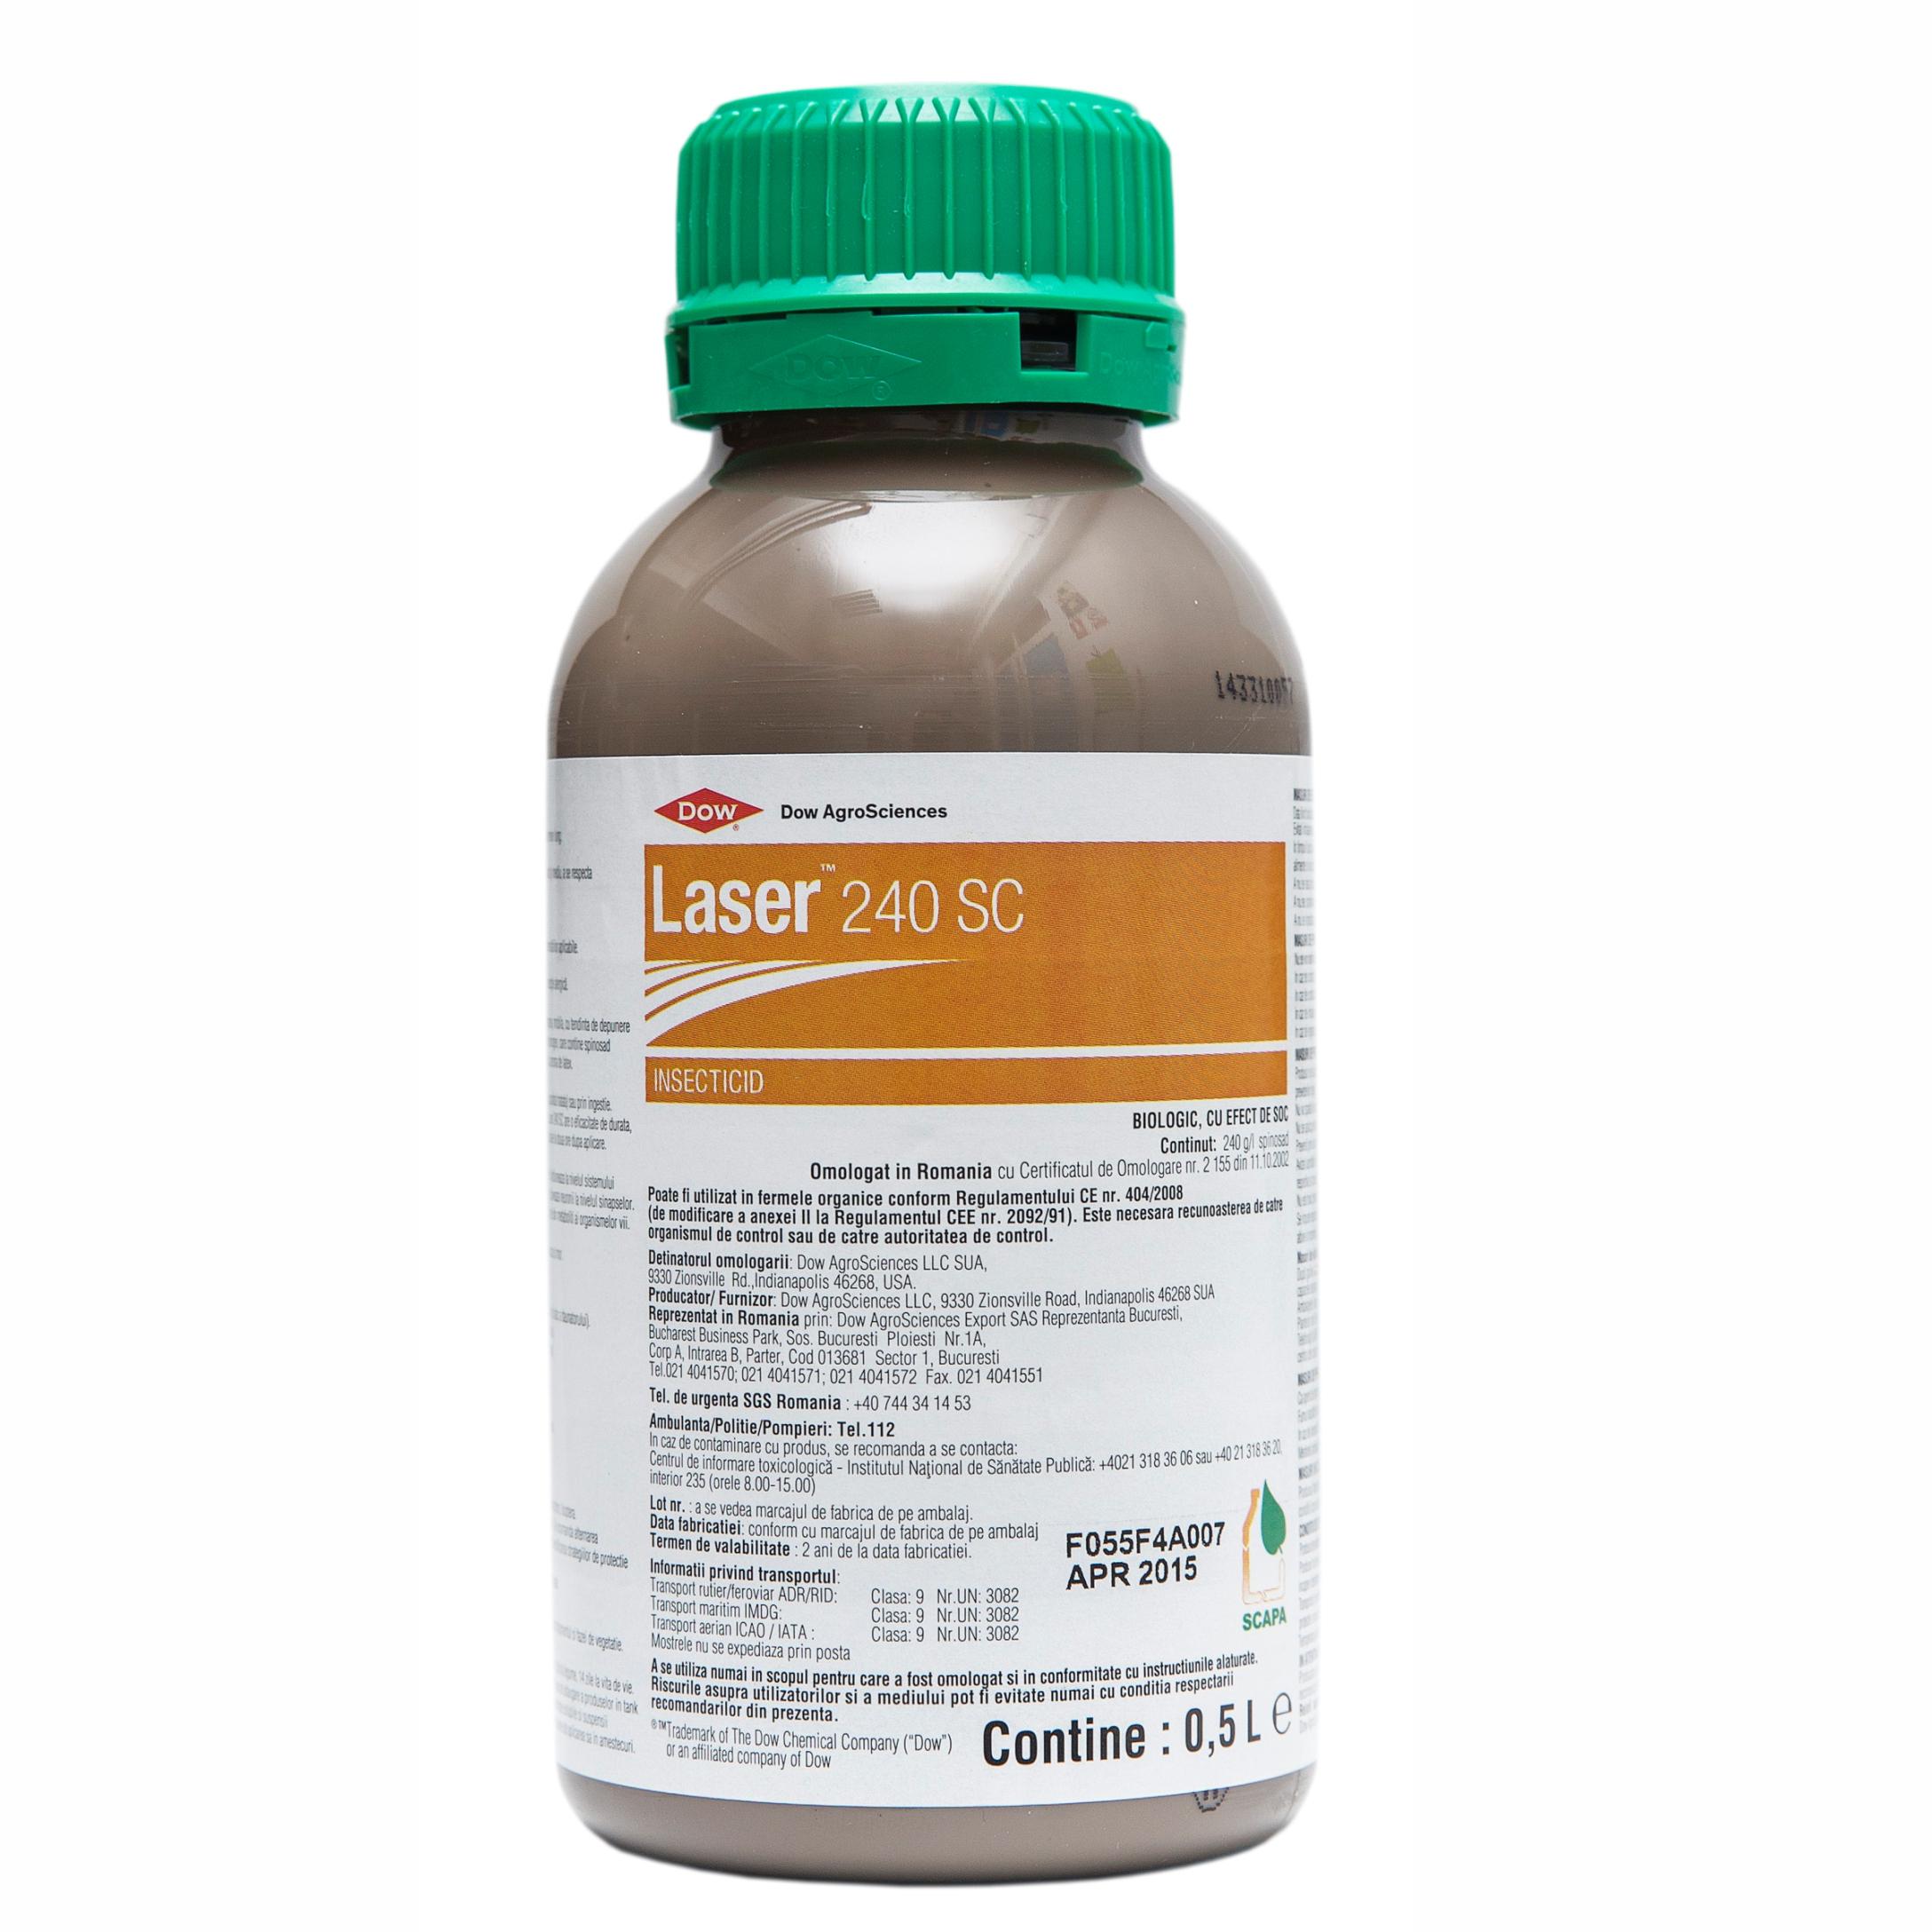 LASER 240 SC - Insecticid biologic